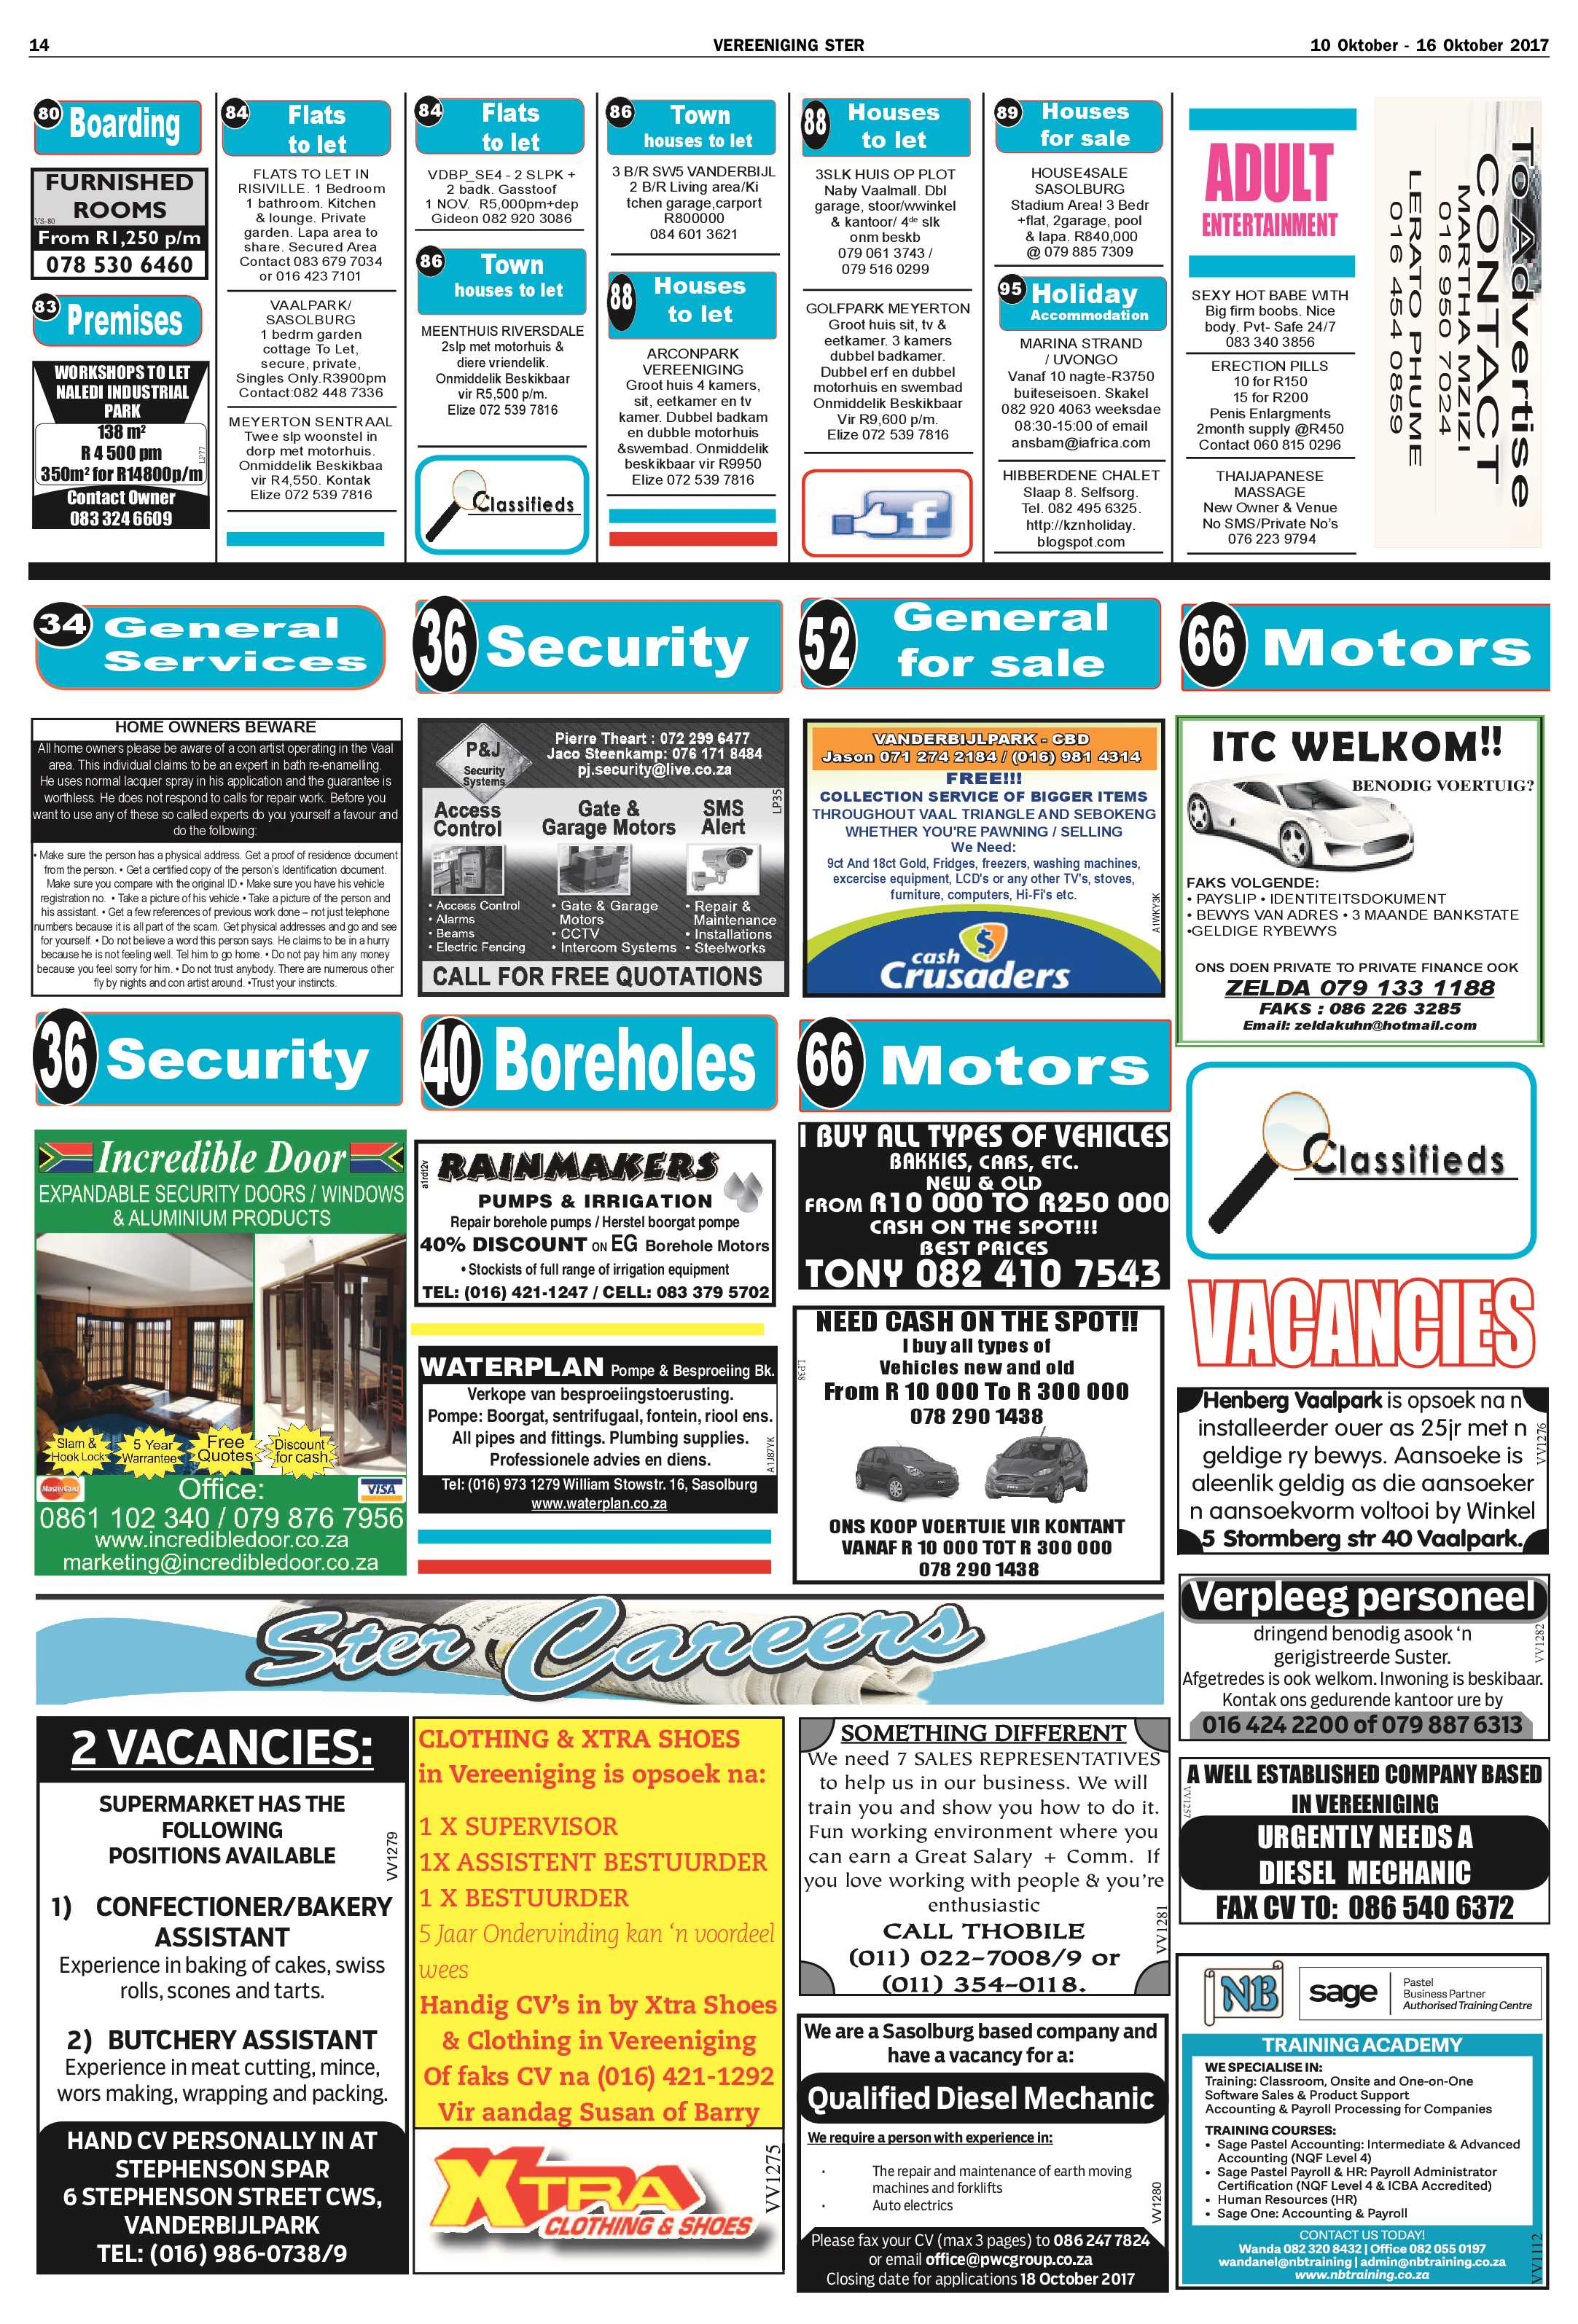 vereeniging-ster-10-16-oktober-2017-epapers-page-14